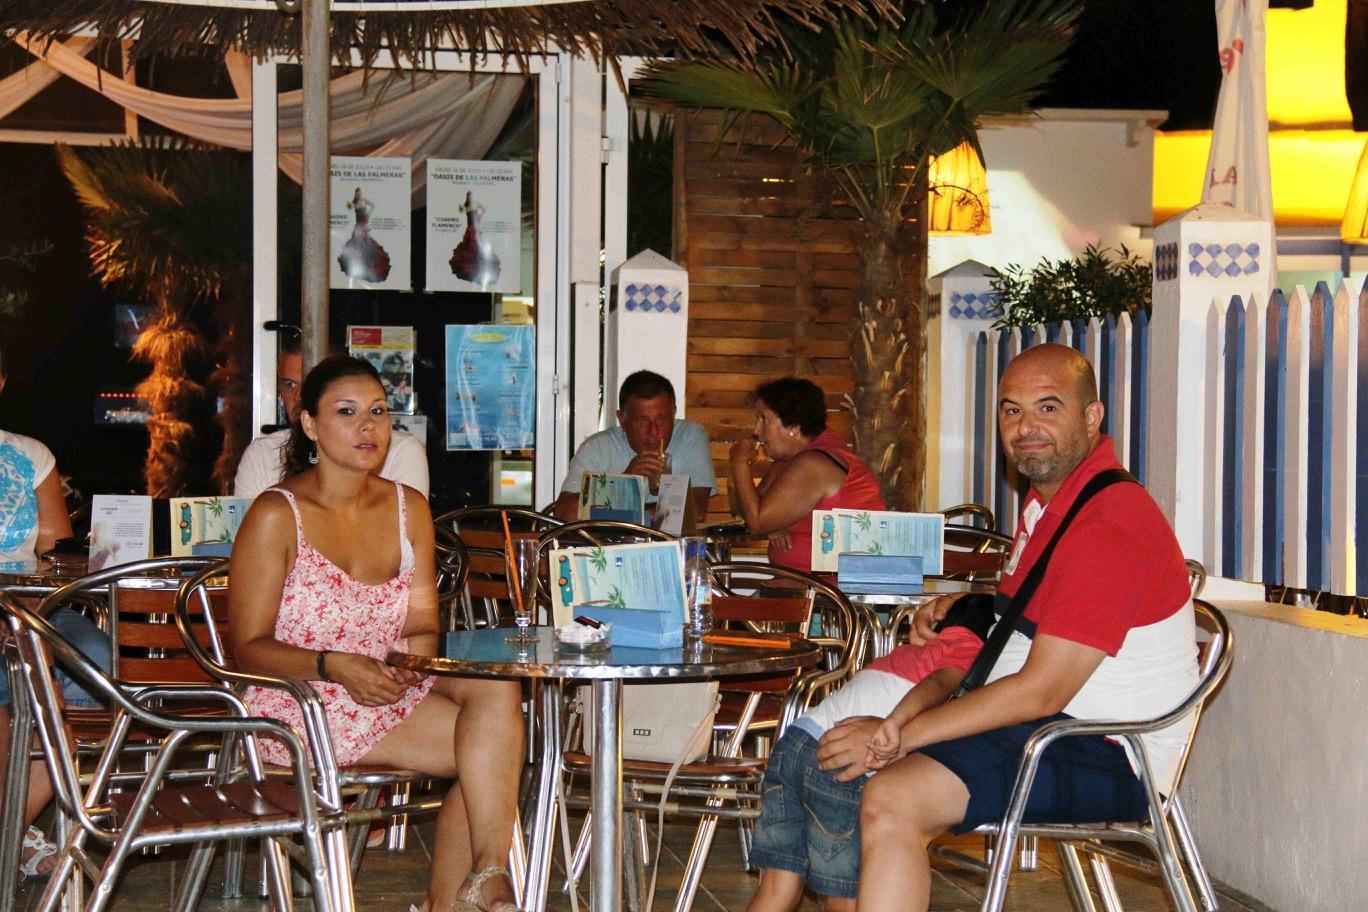 Inauguración Chill out Oasis Las Palmeras con Conexión 80